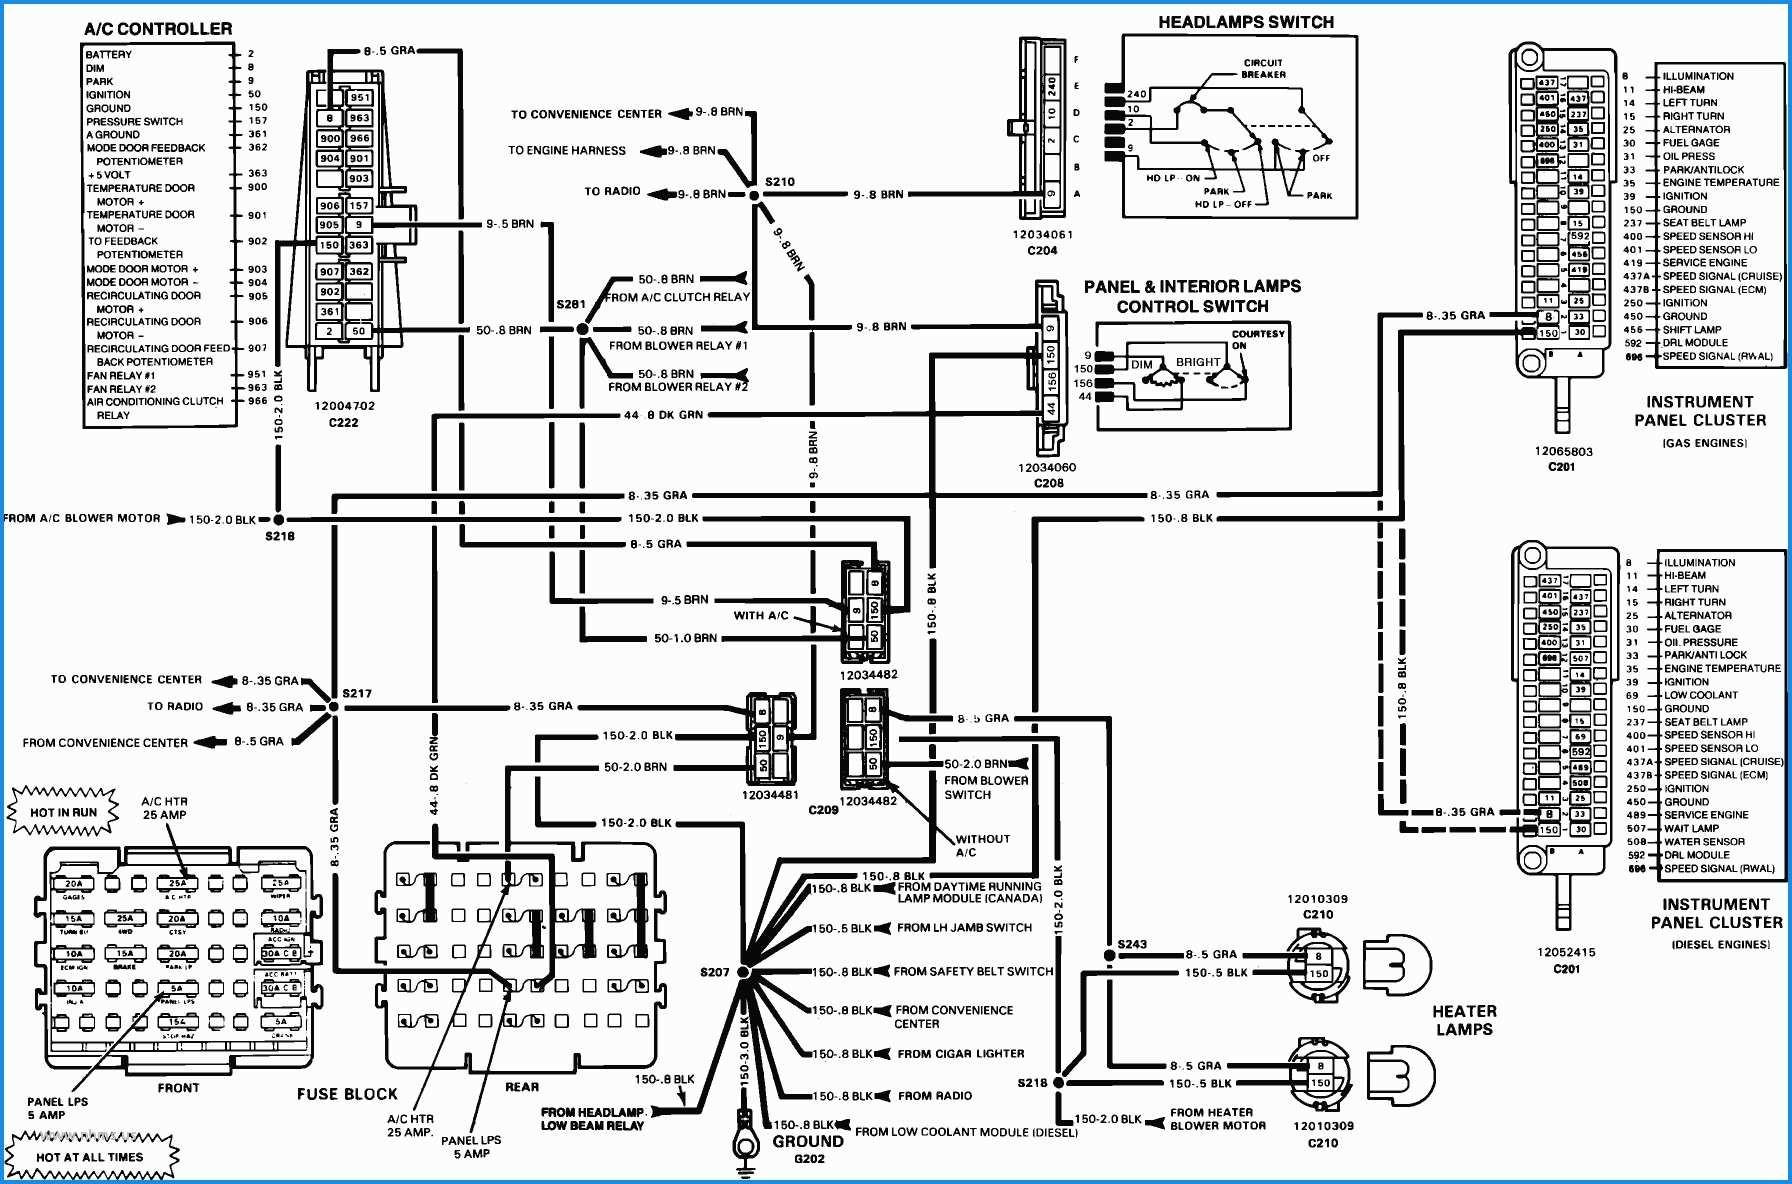 2008 Gmc 25000 Brake Lamp Diagram Diagram] 1984 Gmc High Sierra Wiring Diagram Full Version Hd